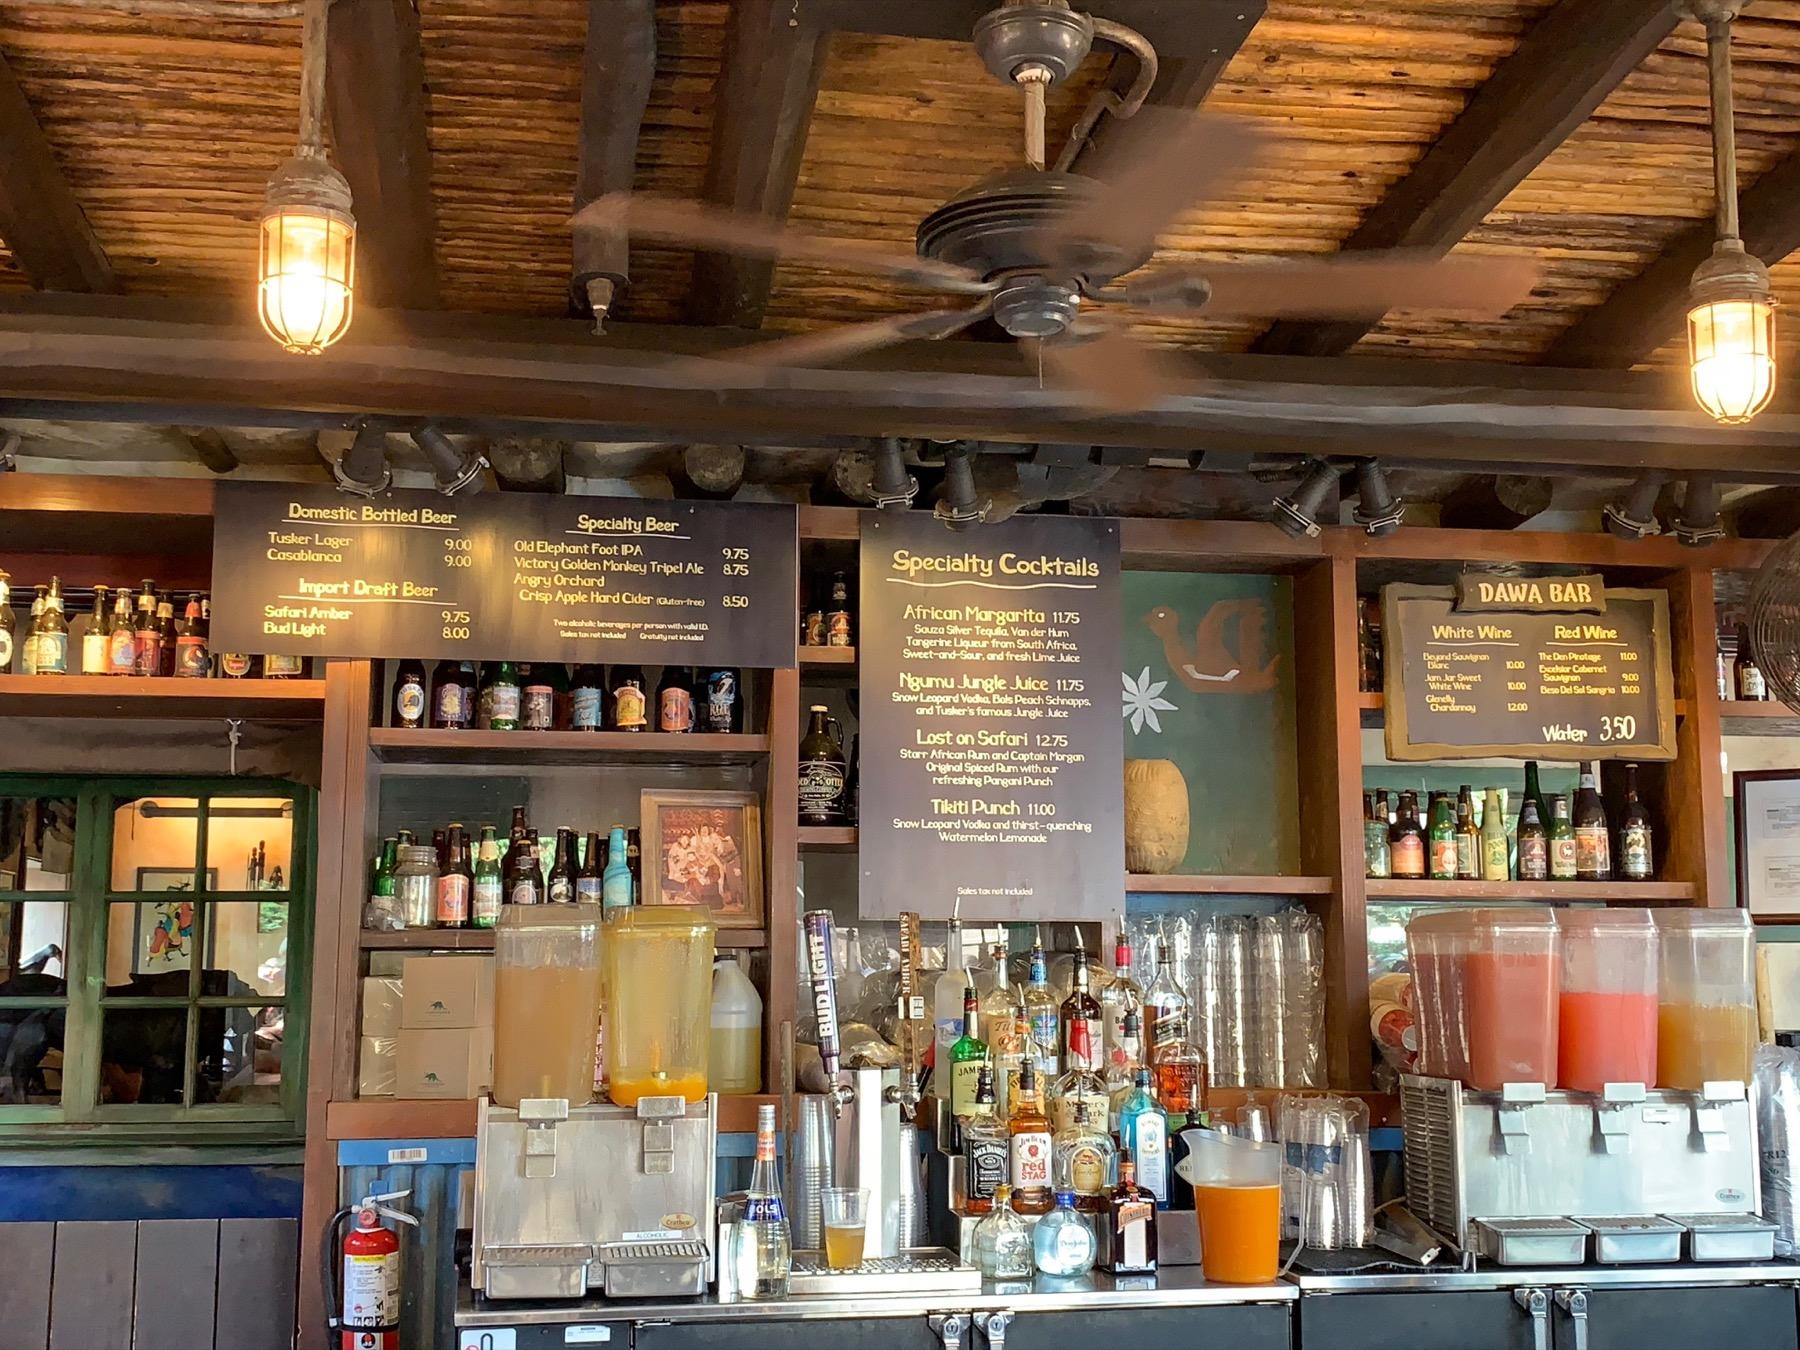 dawa bar 2 where to drink at animal kingdom.jpg